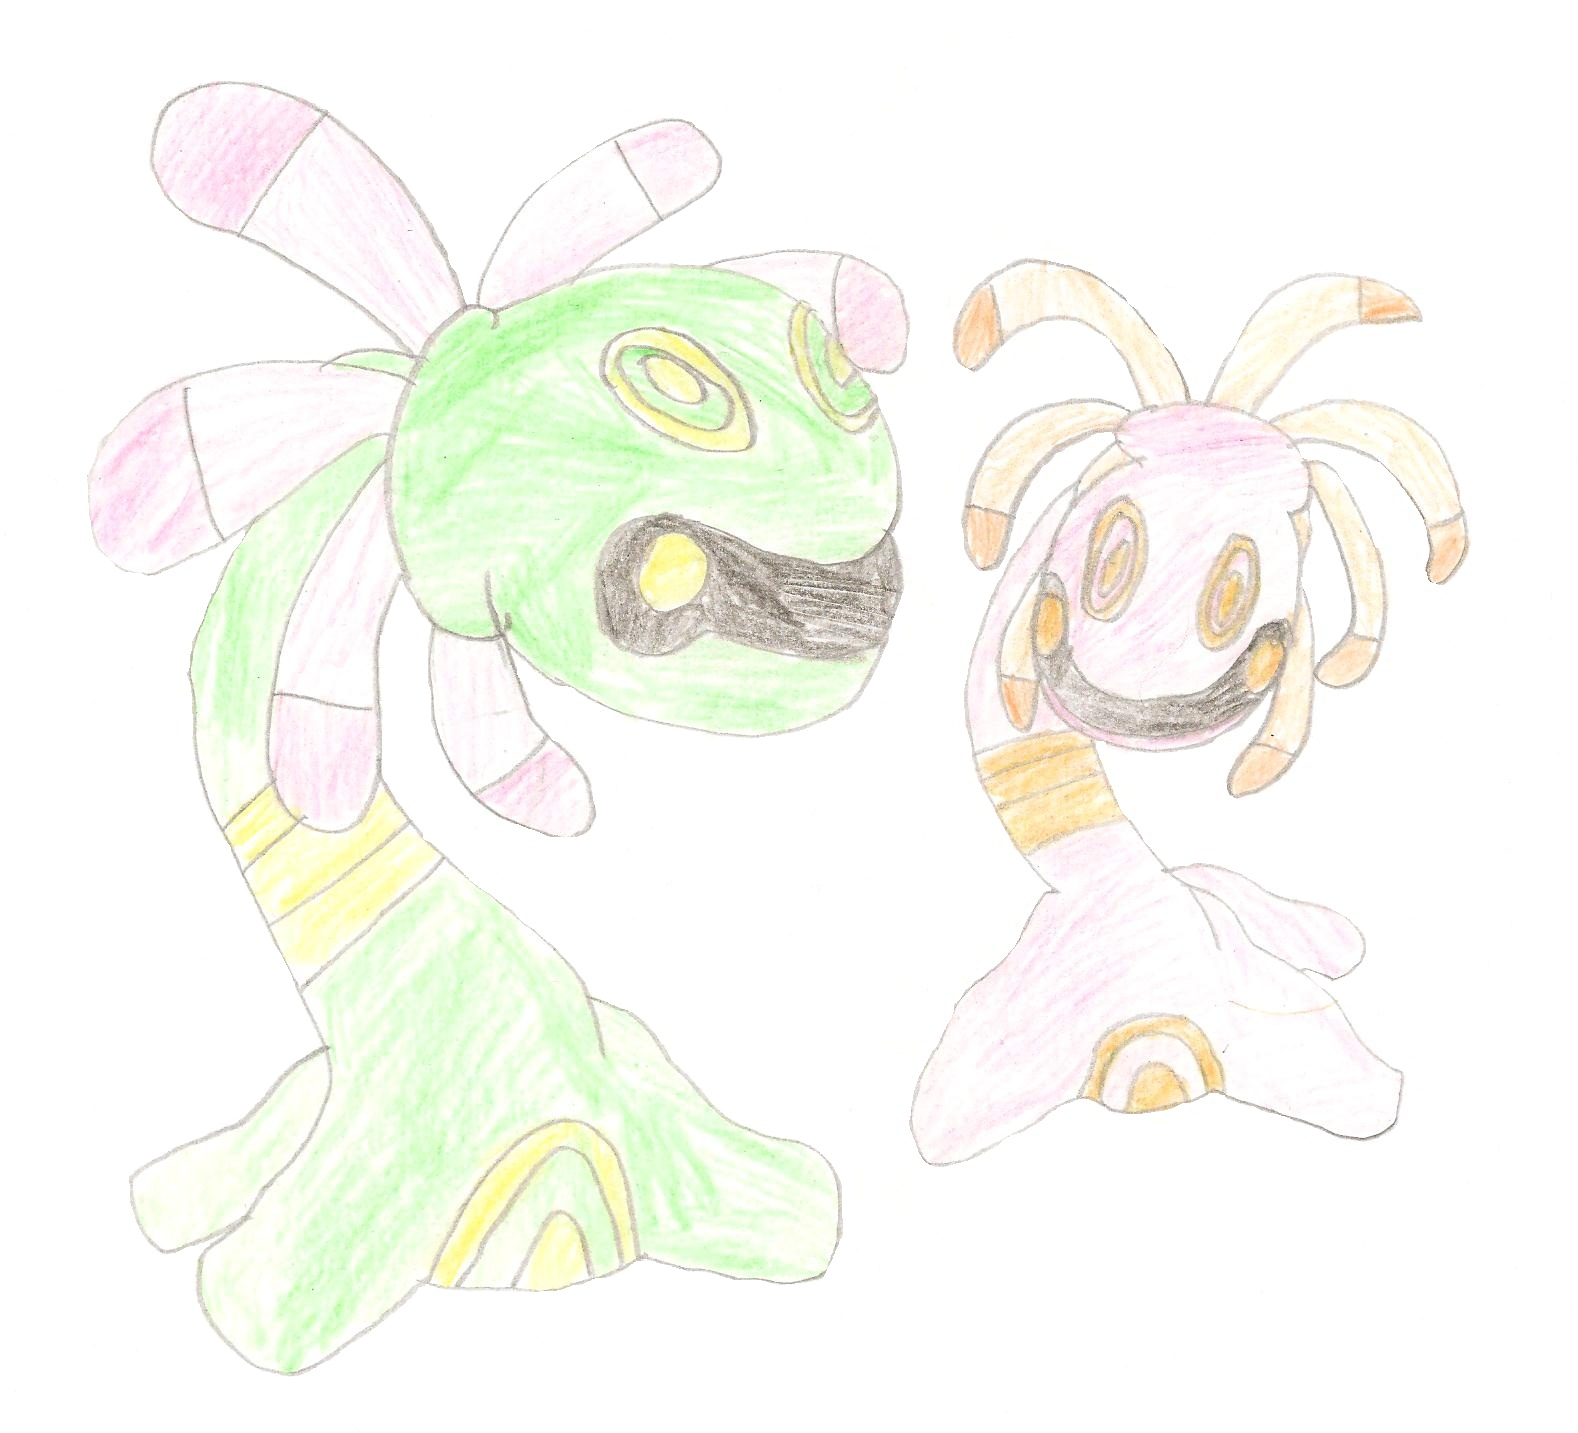 Lileep Pokémon  Bulbapedia the communitydriven